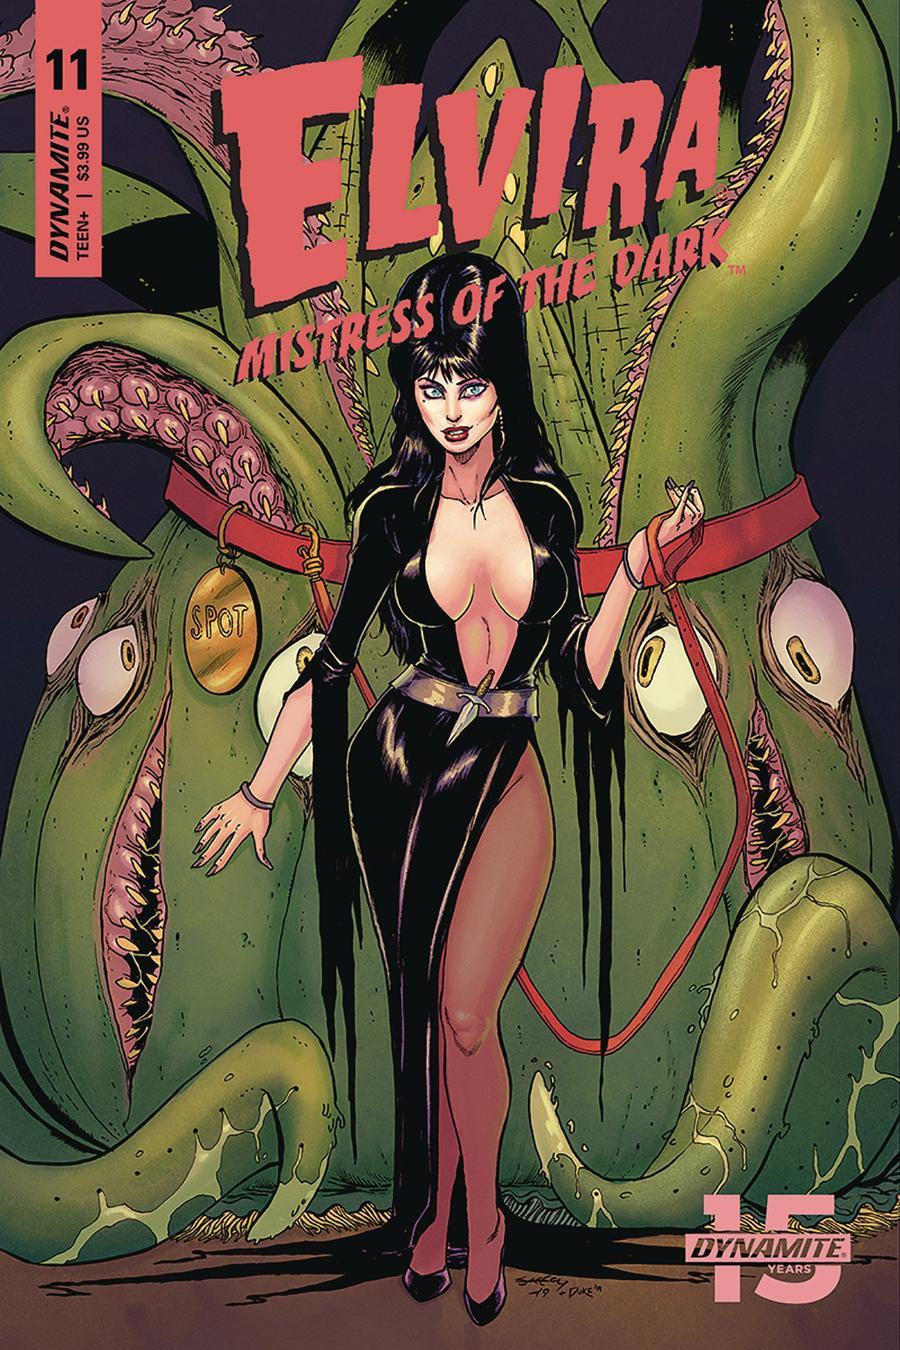 Elvira Mistress Of The Dark Vol 2 #11 Cover A Regular Tim Seeley Cover